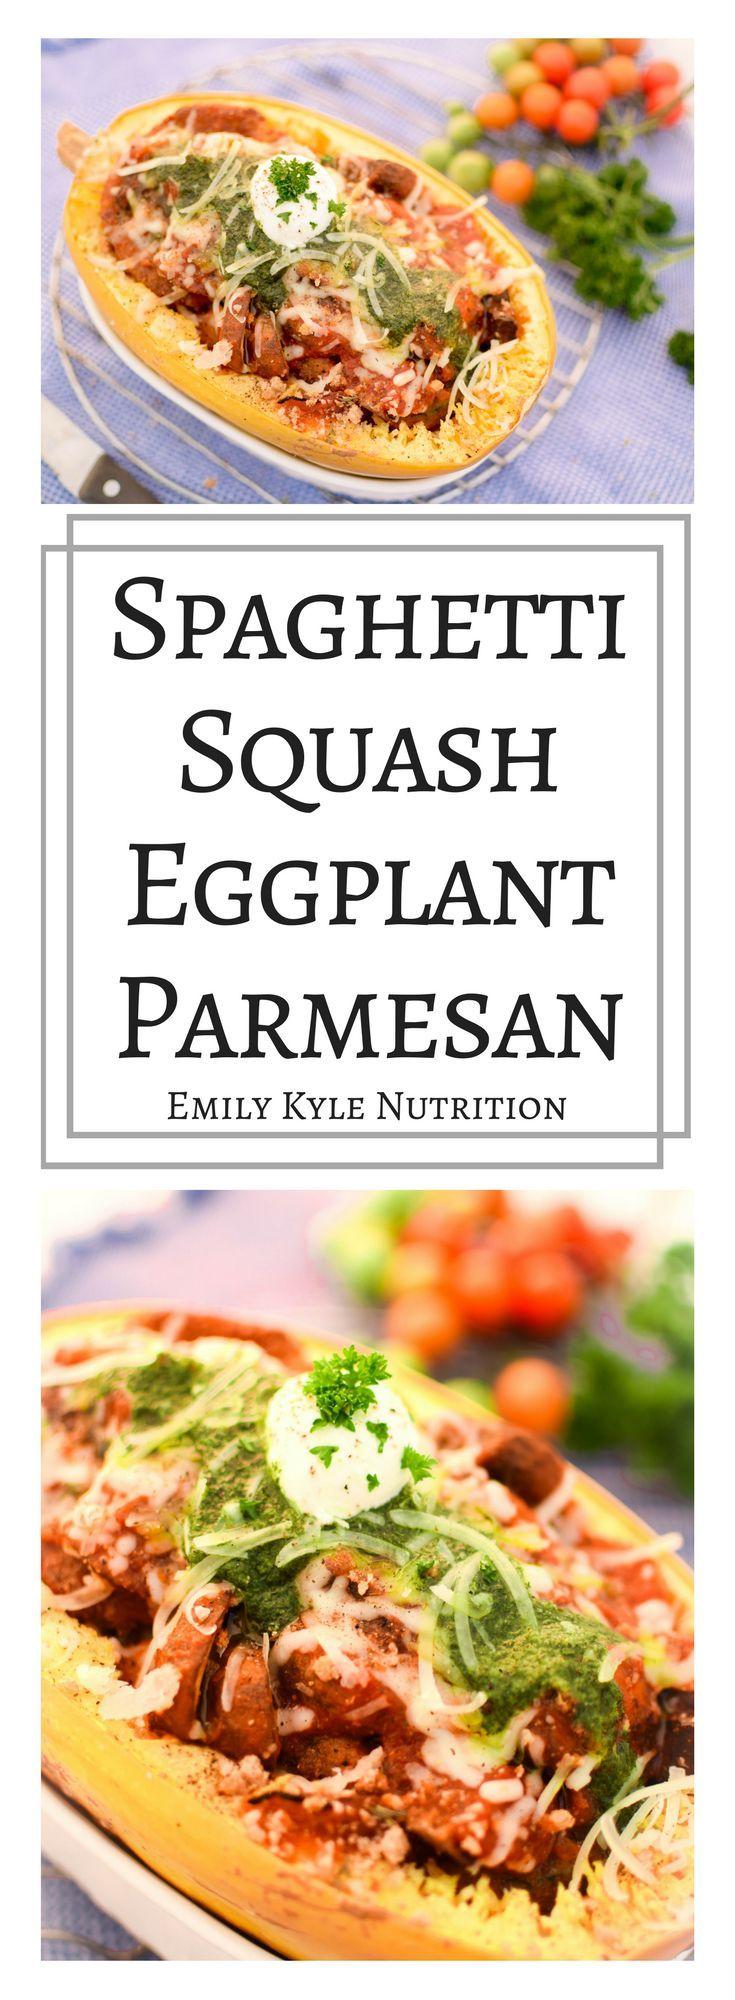 Spaghetti Squash Eggplant Parmesan » Emily Kyle Nutrition